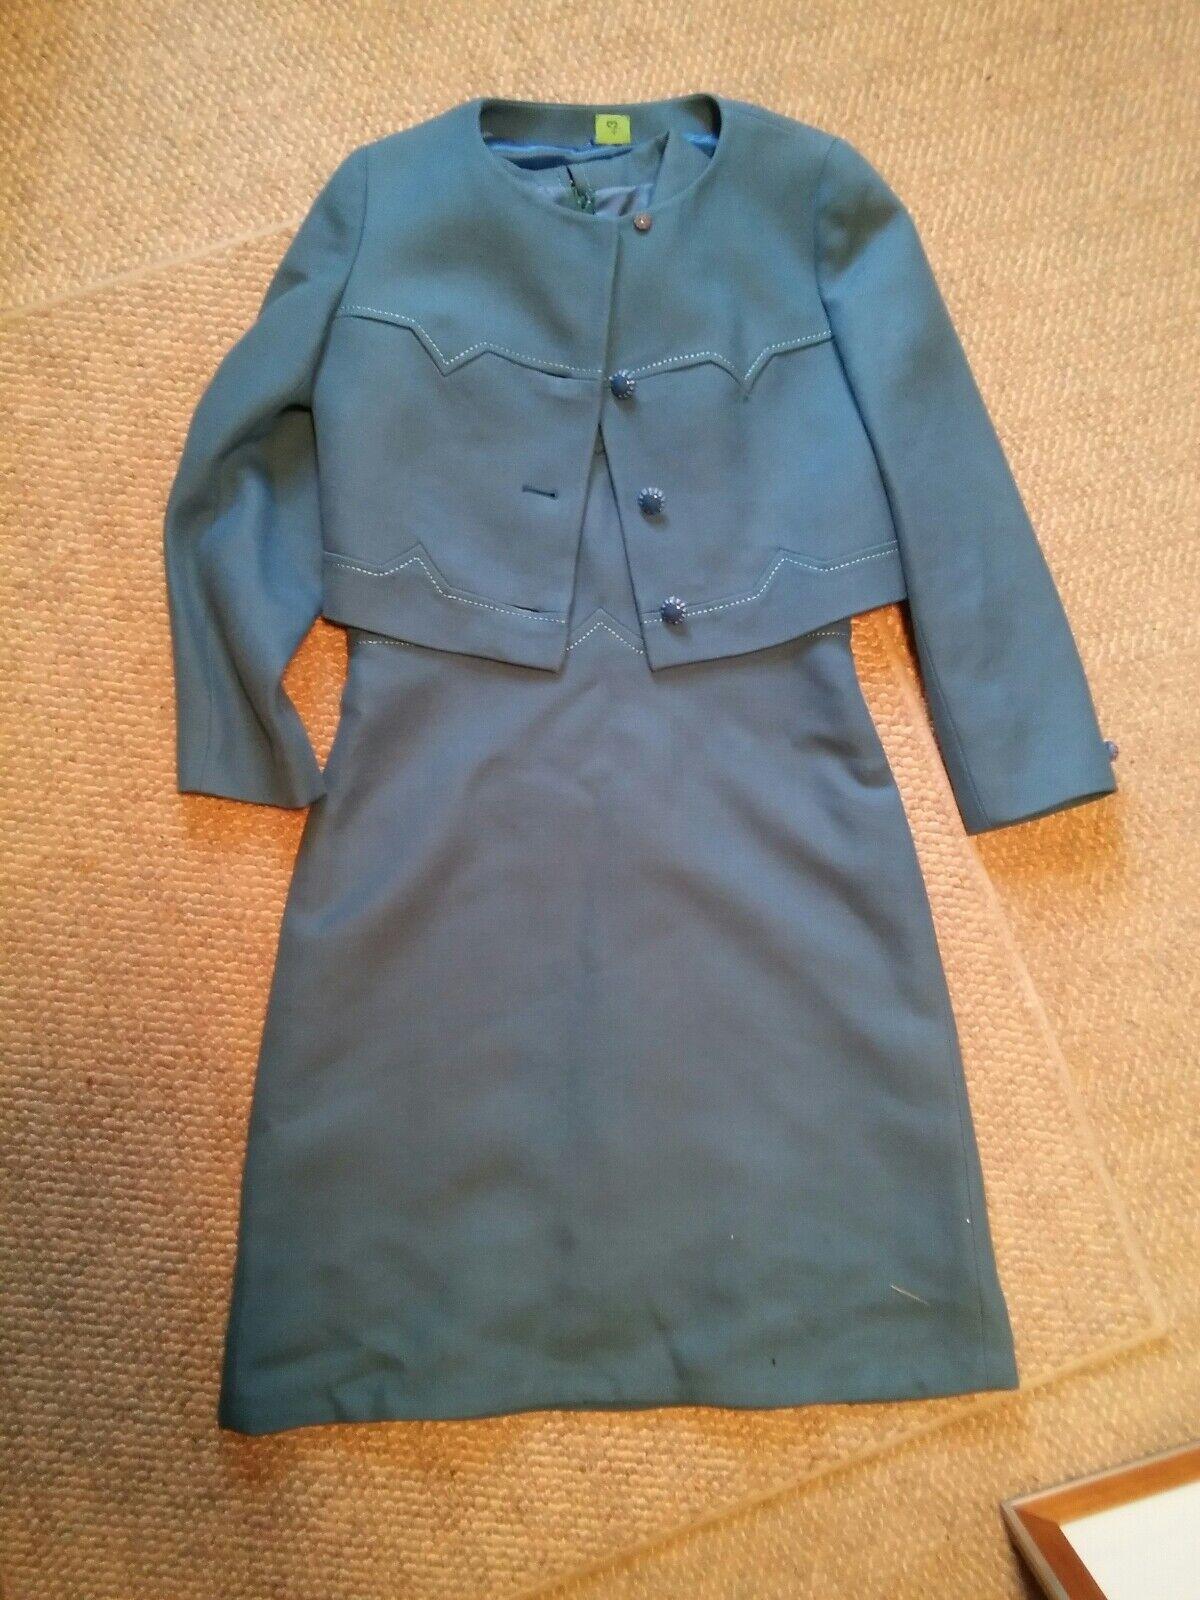 015 VTG Aubrey Segal 100% Wool 2 Piece Jackie O Style Dress Coat Combo Lt Blue